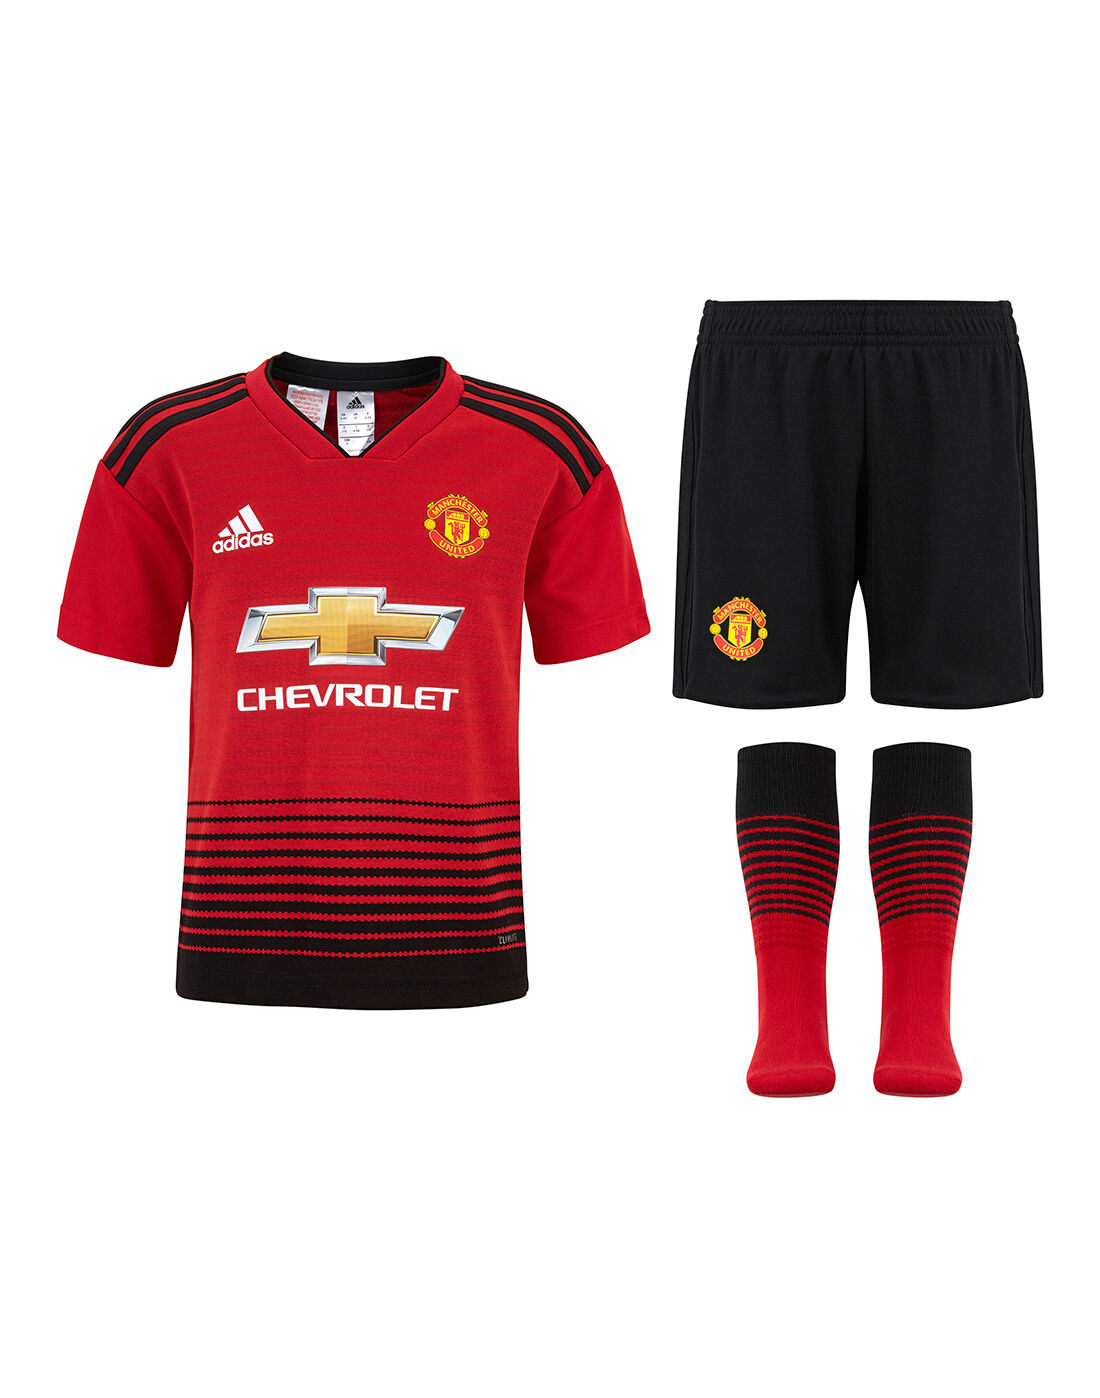 Kids Man United 18/19 Home Kit | adidas | Life Style Sports